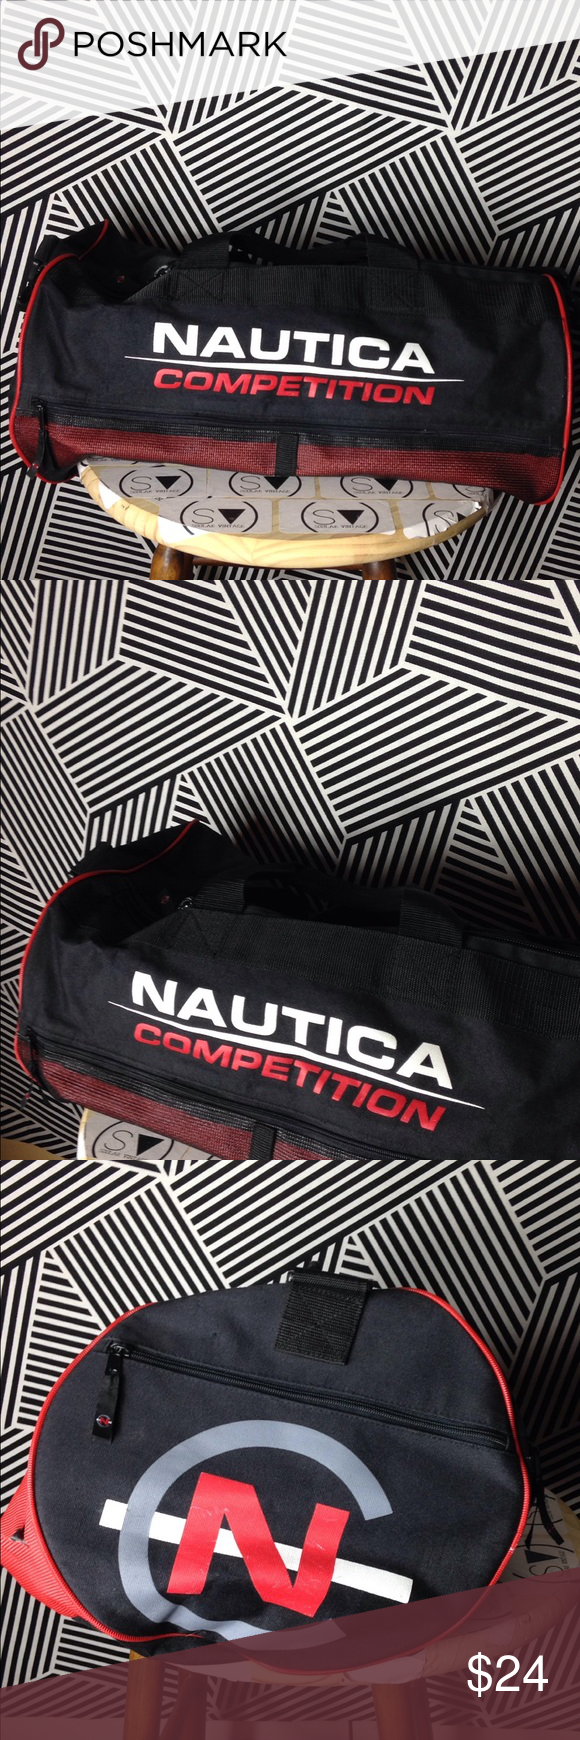 Vintage Nautica Competition Duffel x